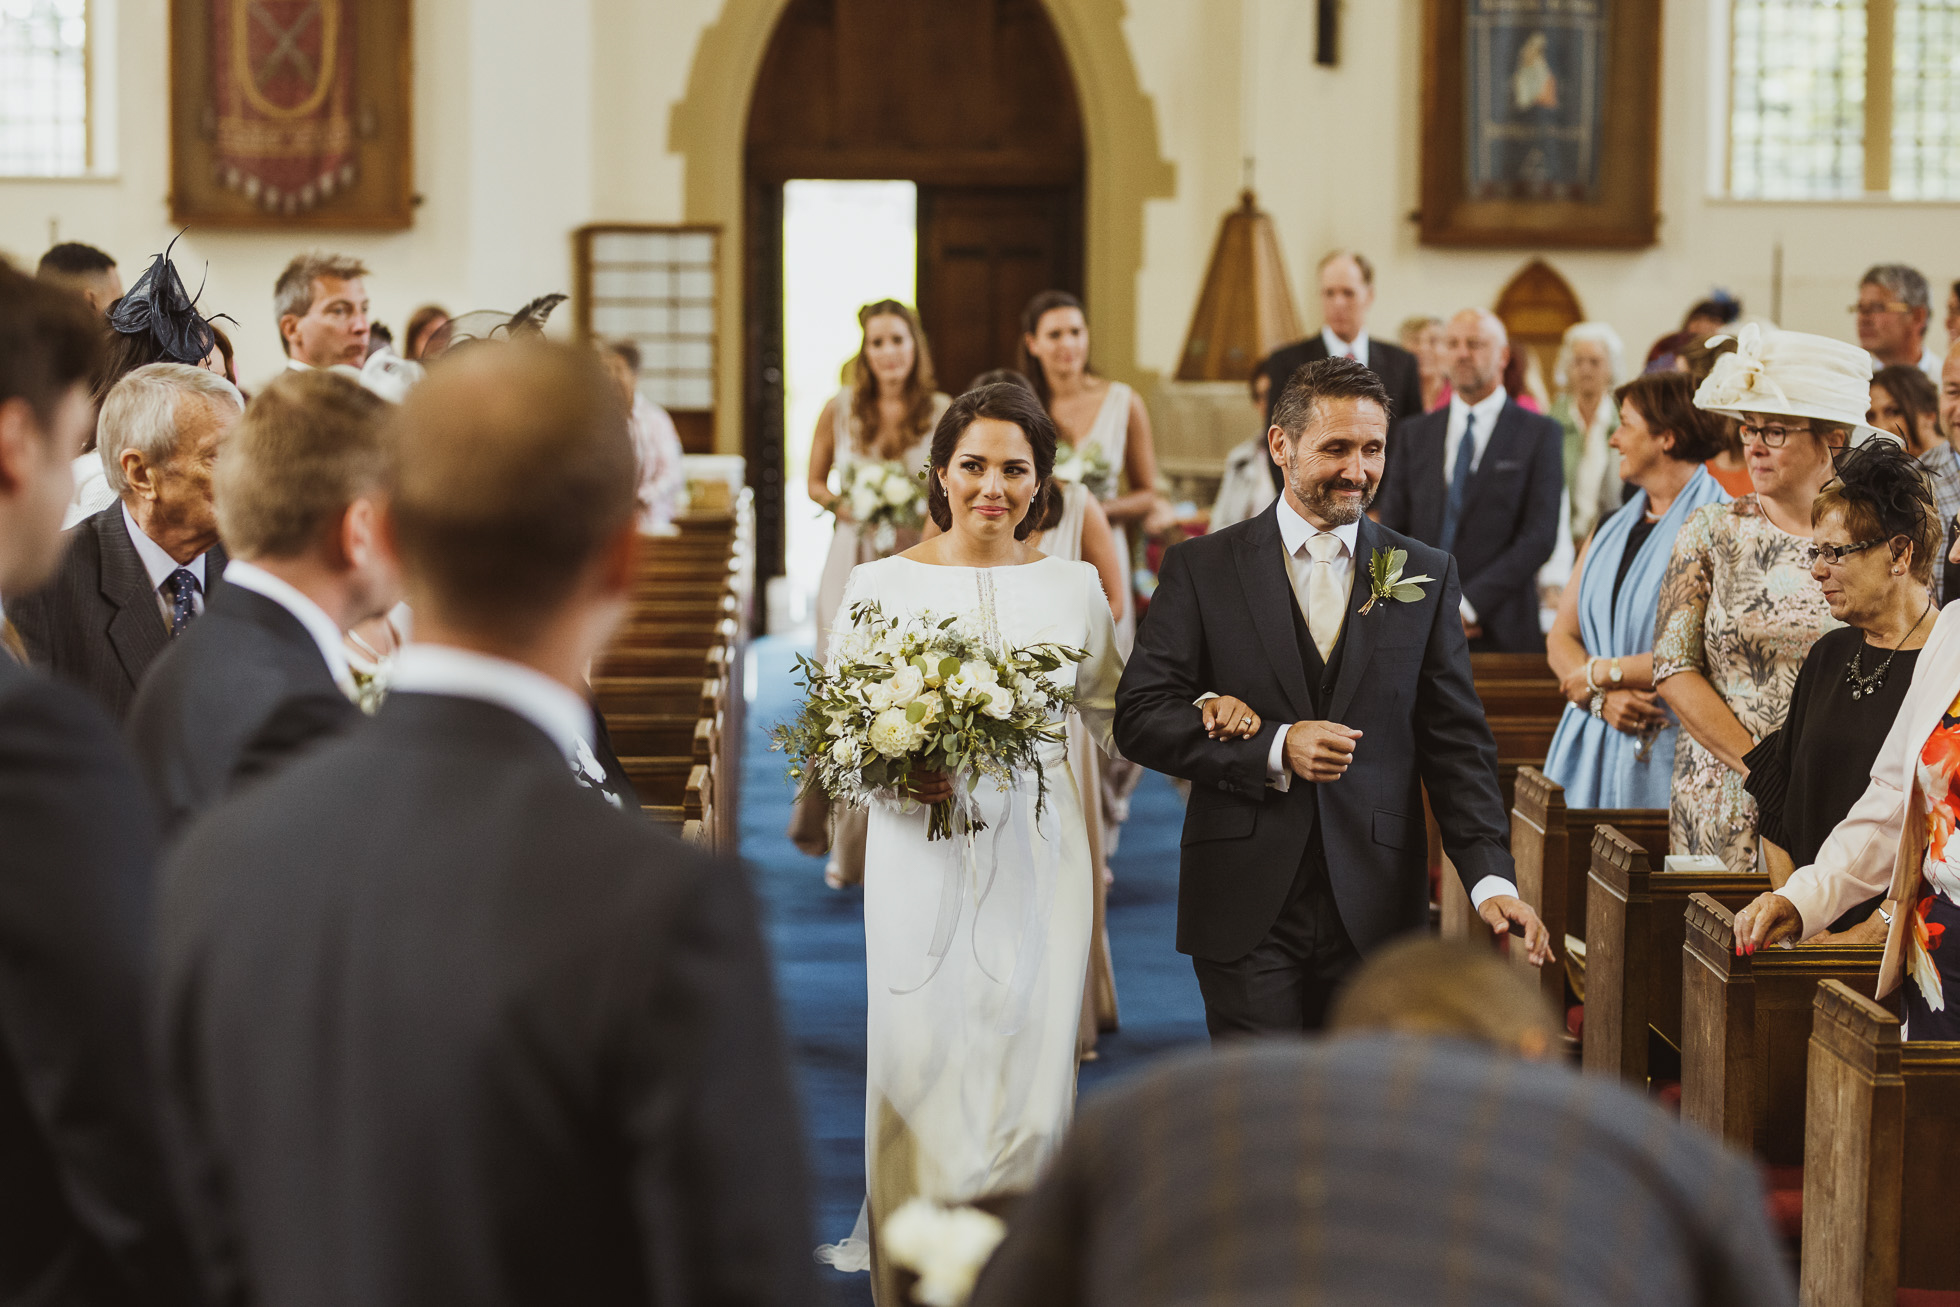 woodman_inn_thunderbridge_wedding_photographer-50.jpg